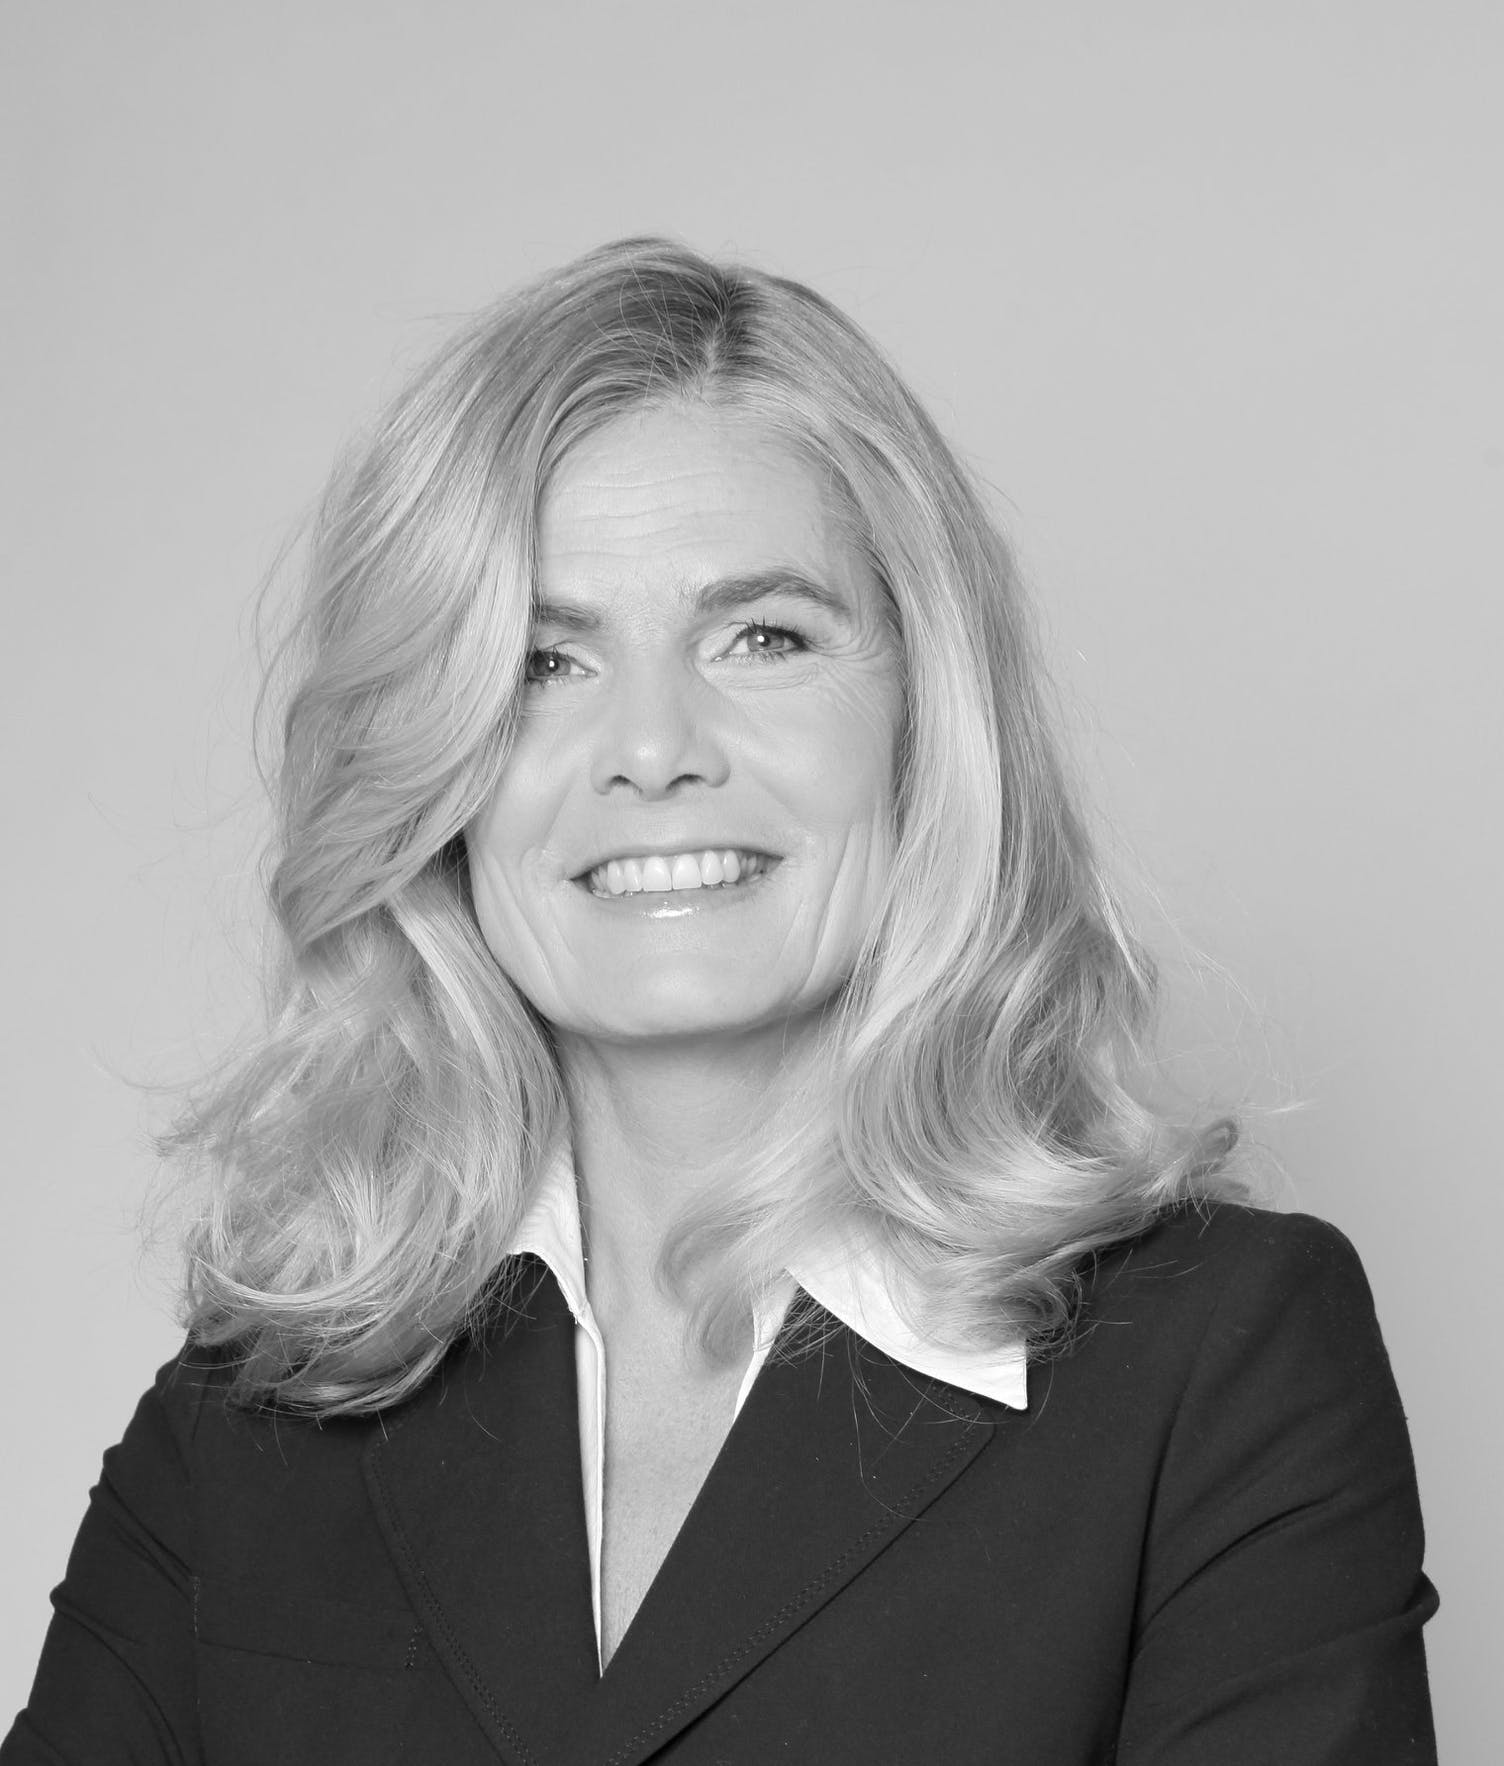 Bianca Brinker